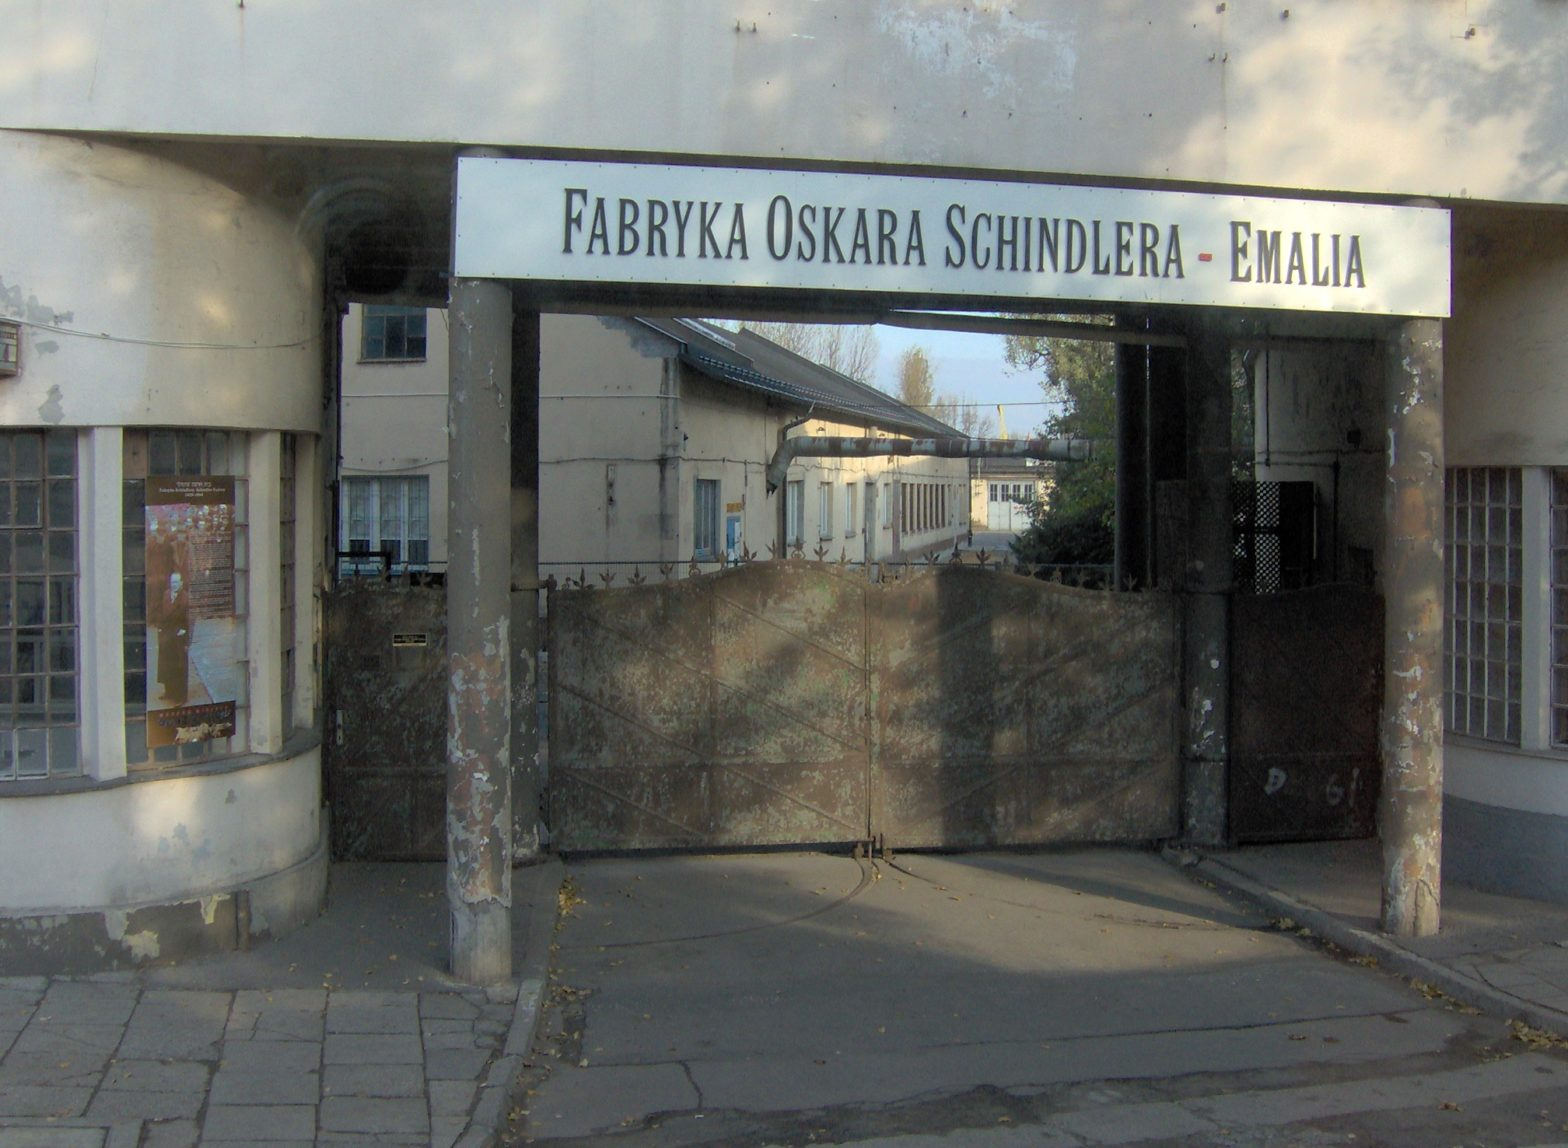 Fábrika de Oskar Schindler en Cracovia - Foto By I, Noaa.